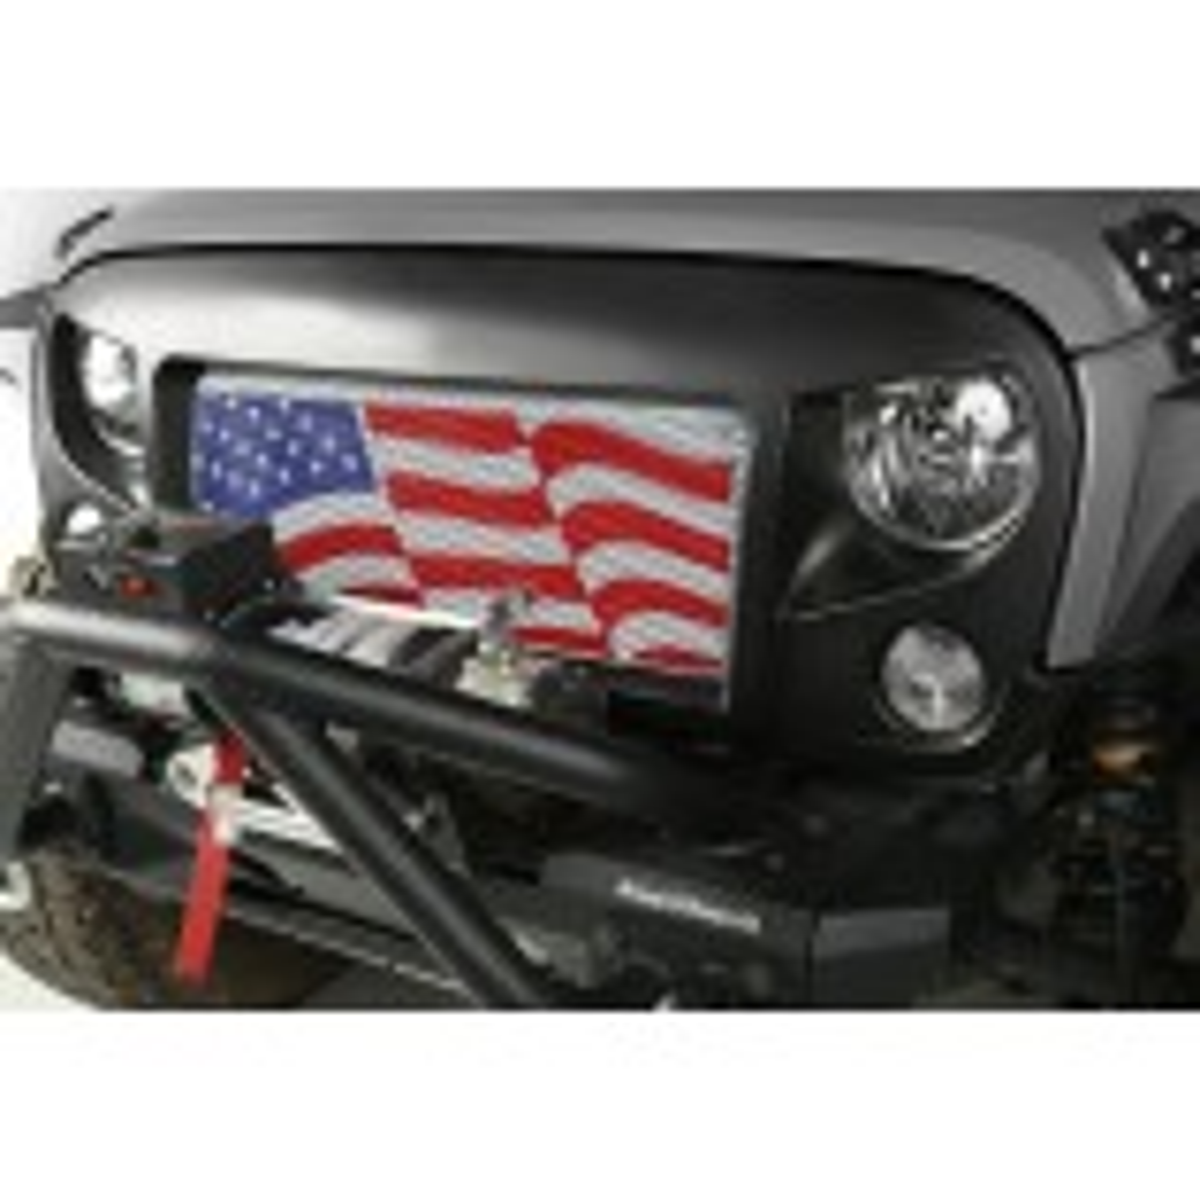 Spartan Grille Insert, American Flag; 07-15 Jeep Wrangler JK